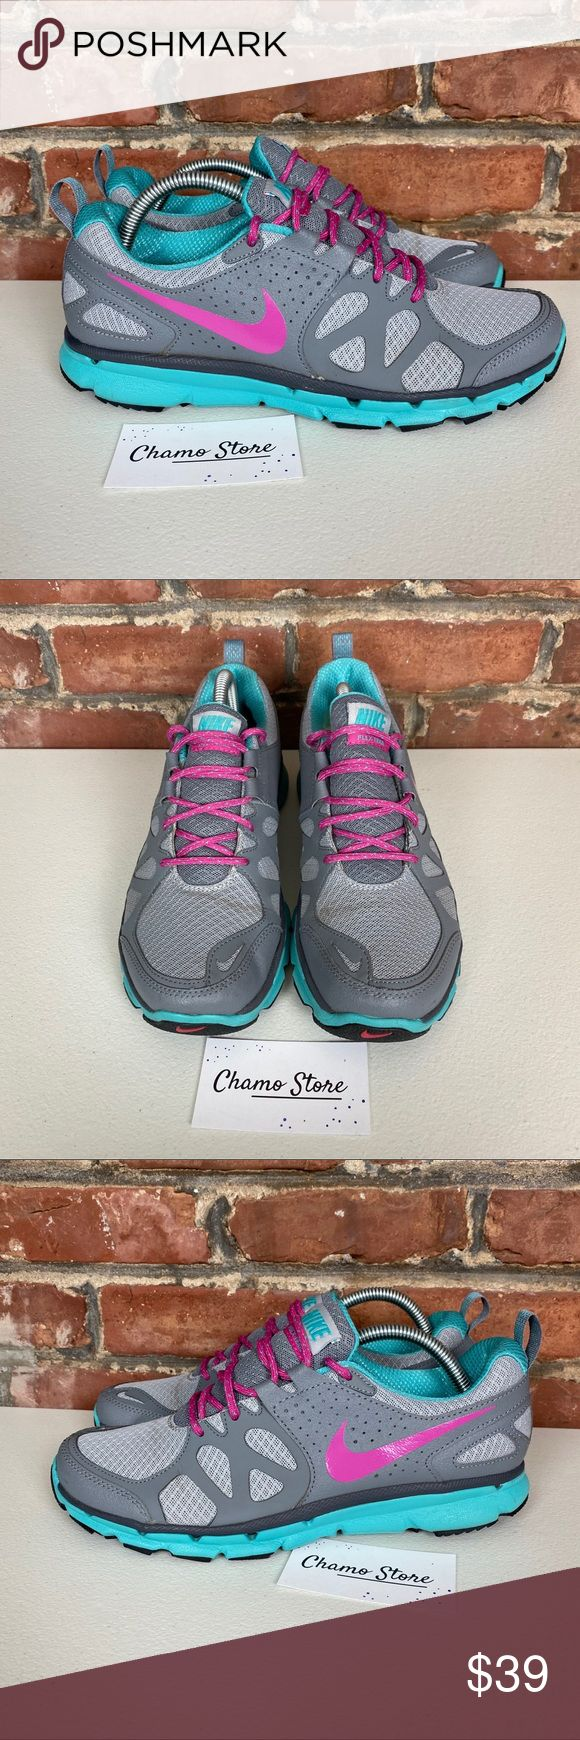 Nike Flex Trail Woman's Sz 10 Gently used. Normal wear. Smoke free. No rips or…